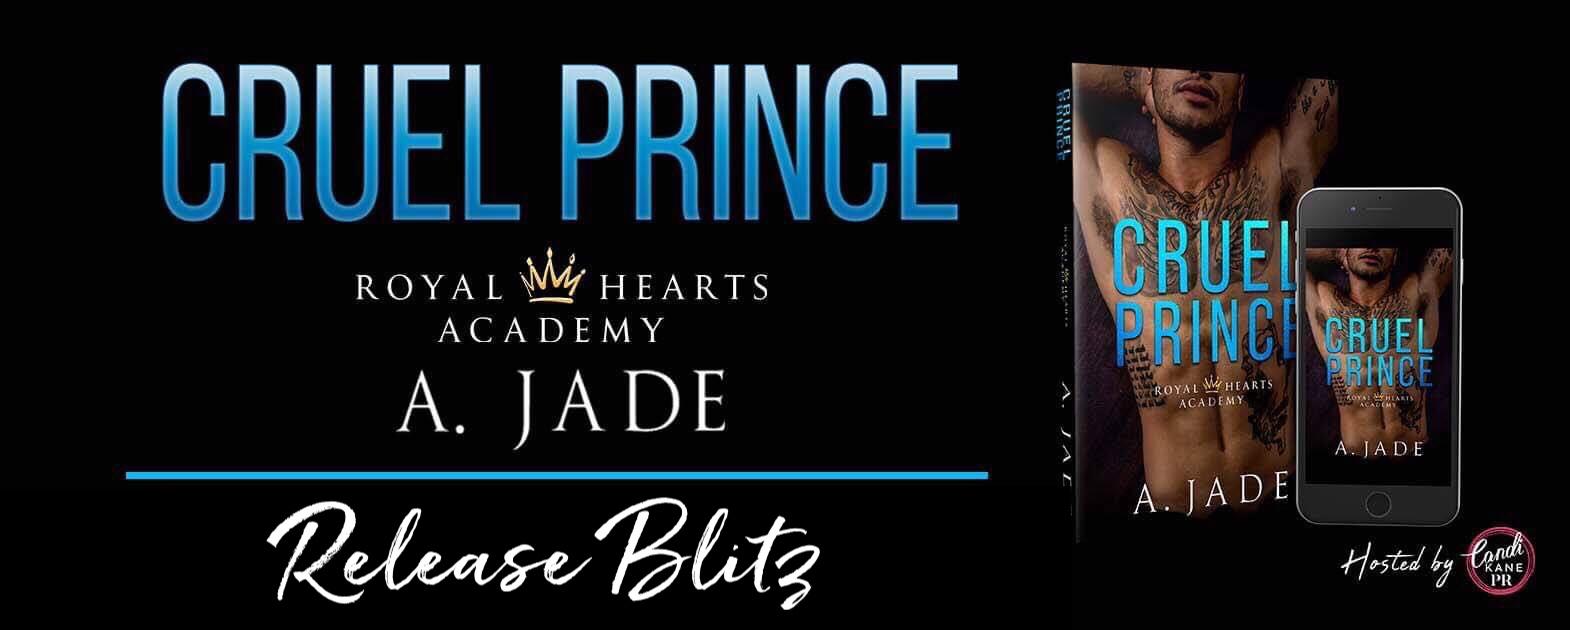 Cruel Prince Release Blitz Banner